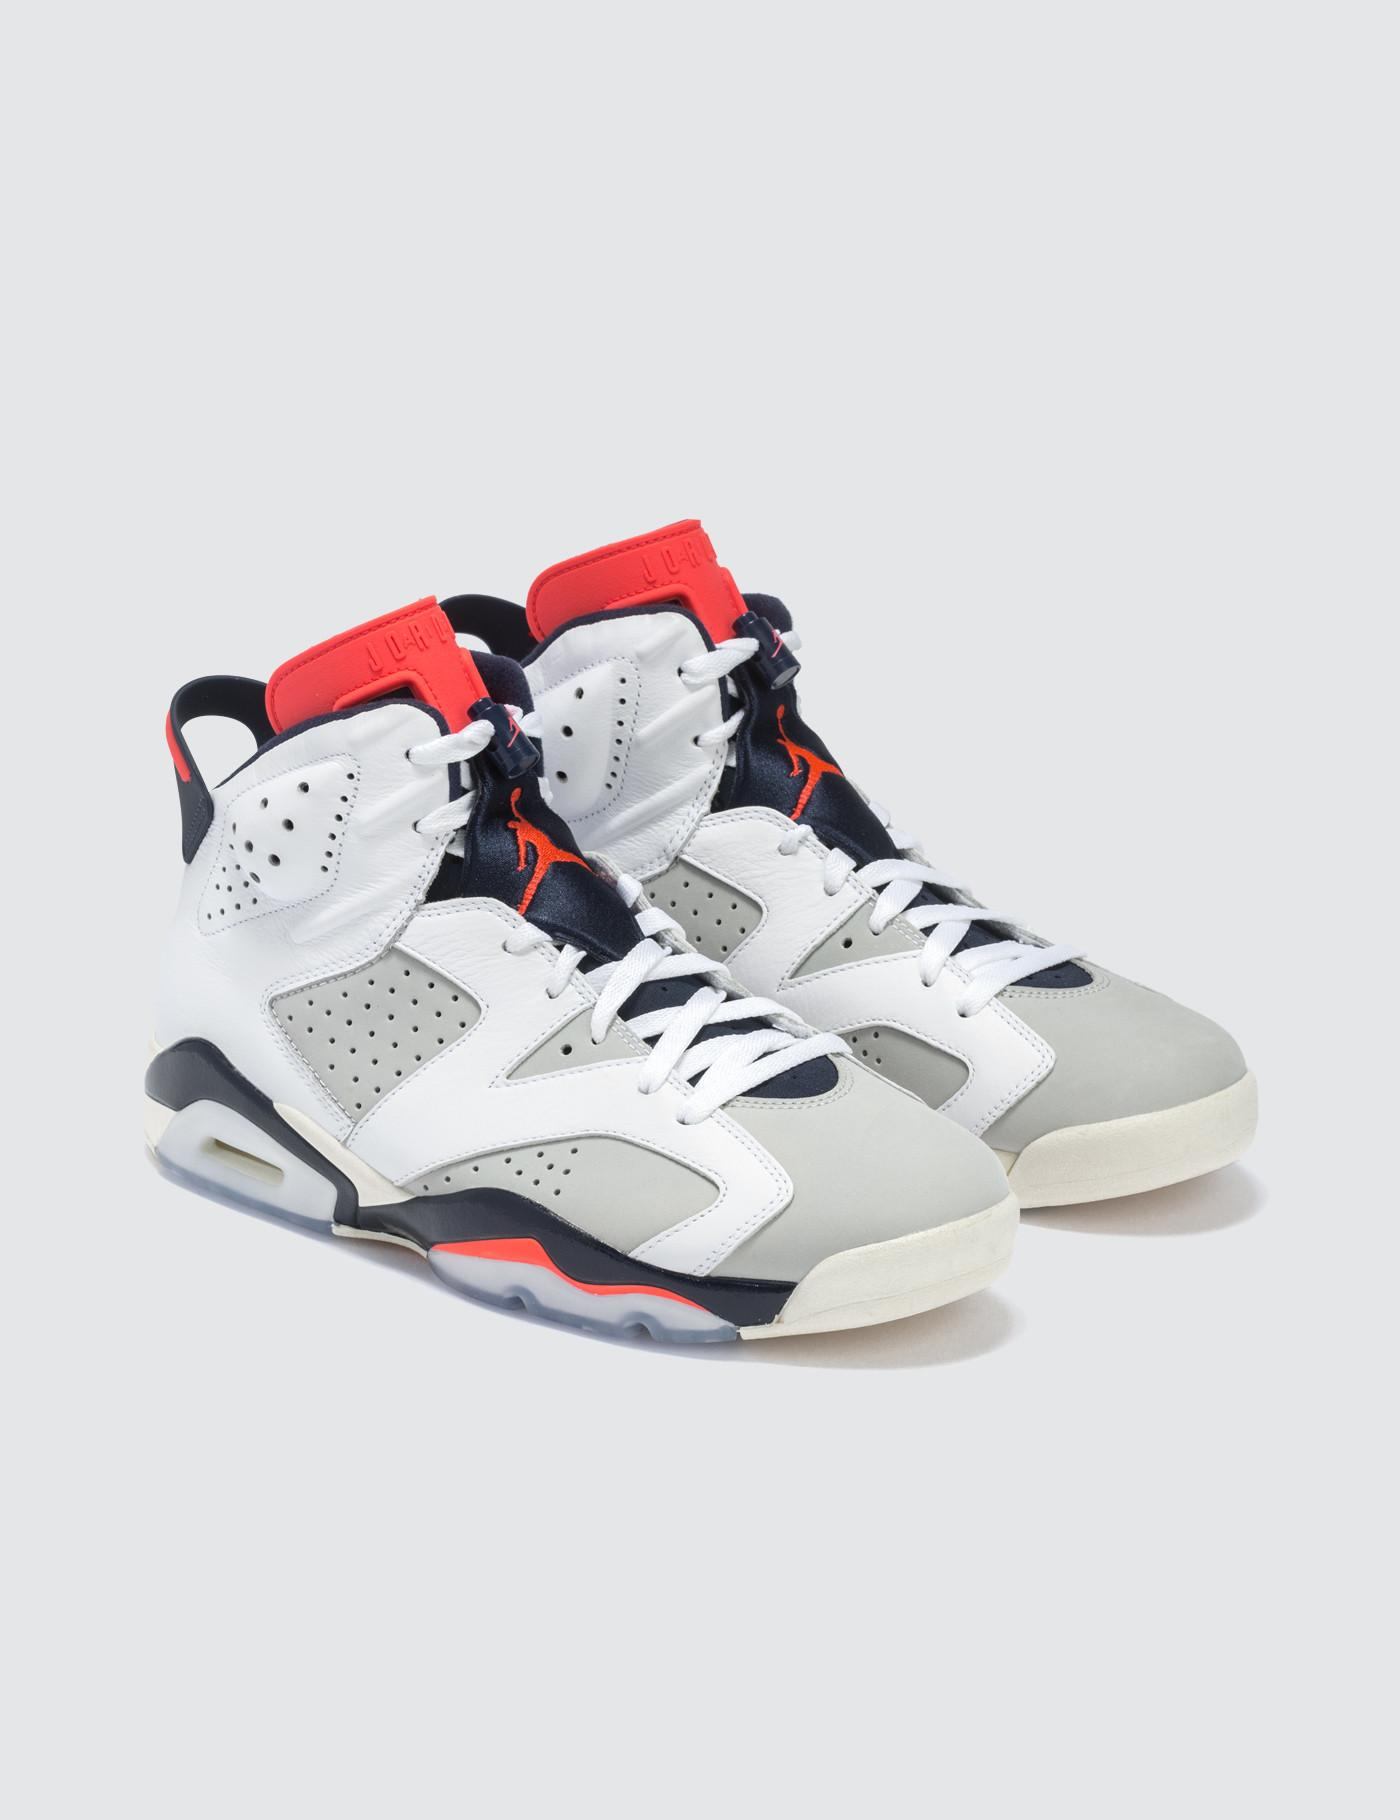 7c5ba75eed1fc9 Lyst - Nike Air Jordan 6 Retro in White for Men - Save 13%